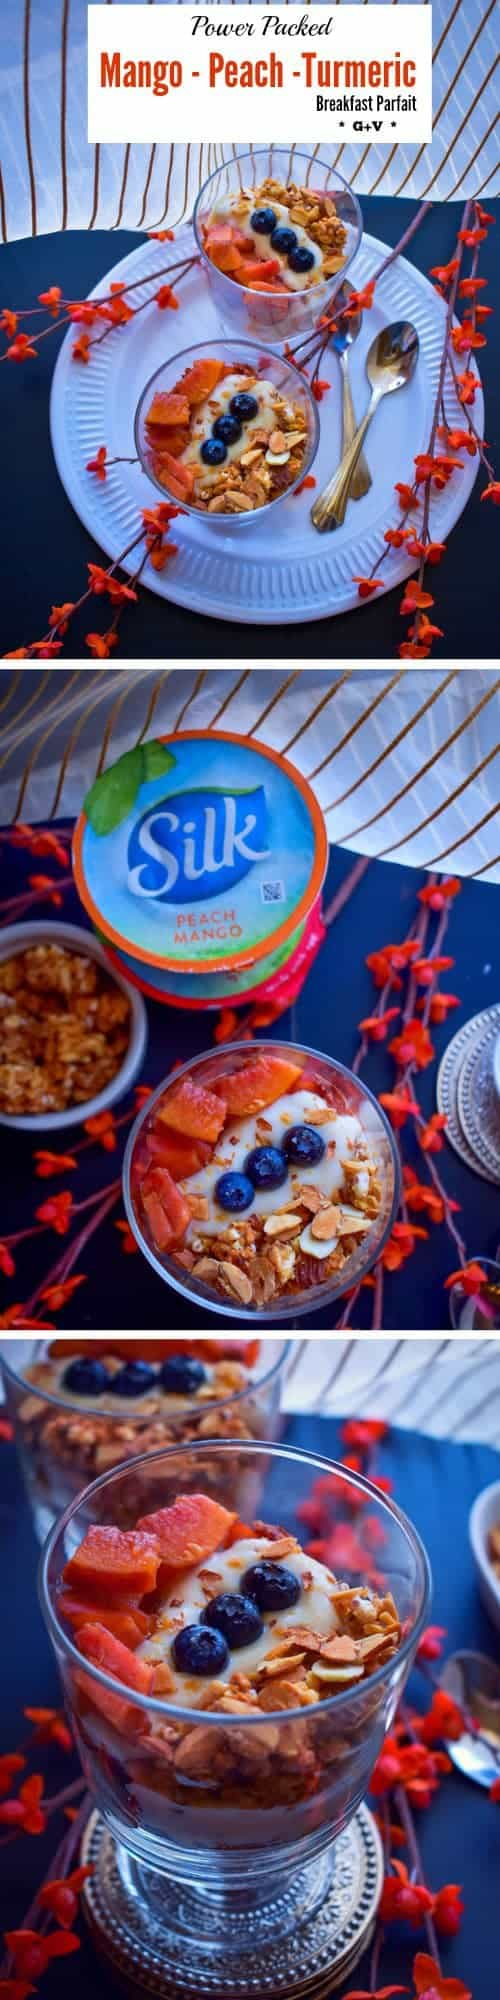 Power Packed Mango-Peach-Turmeric Breakfast Parfait: #DairyFreeGoodness #CollectiveBias #ad @lovemysilk